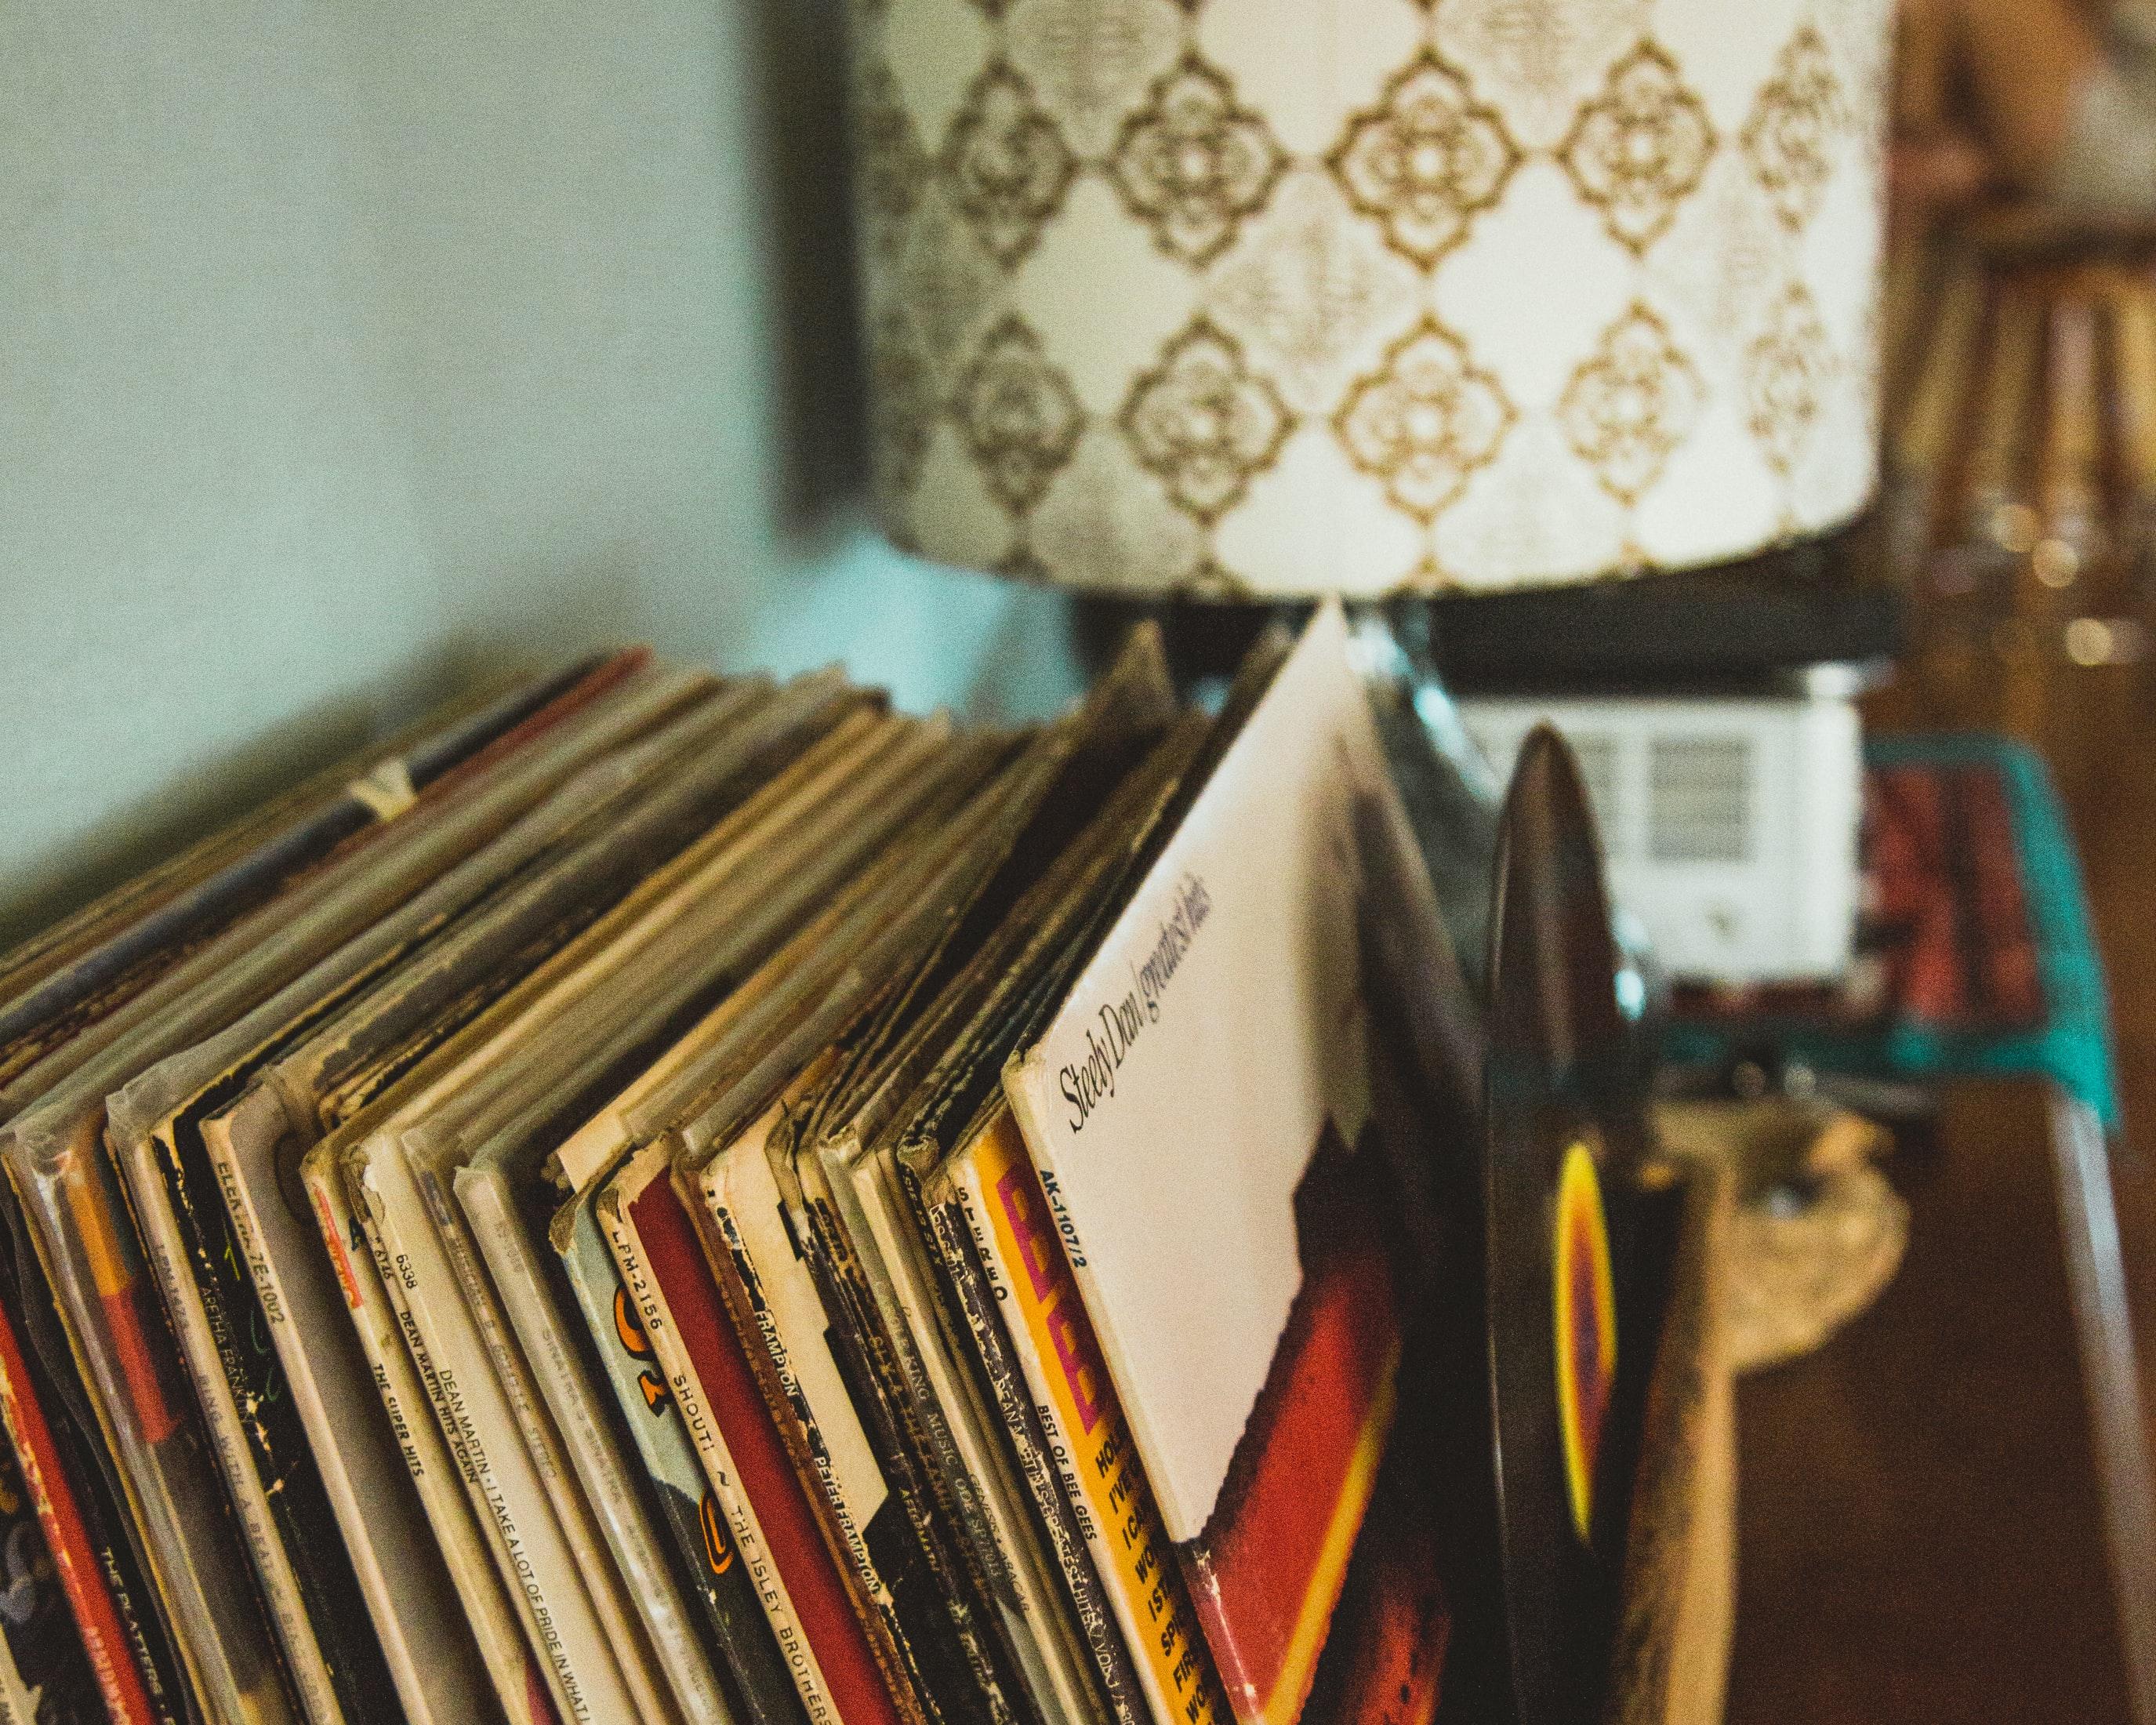 OPINIONS_vinyl_unsplash (2)